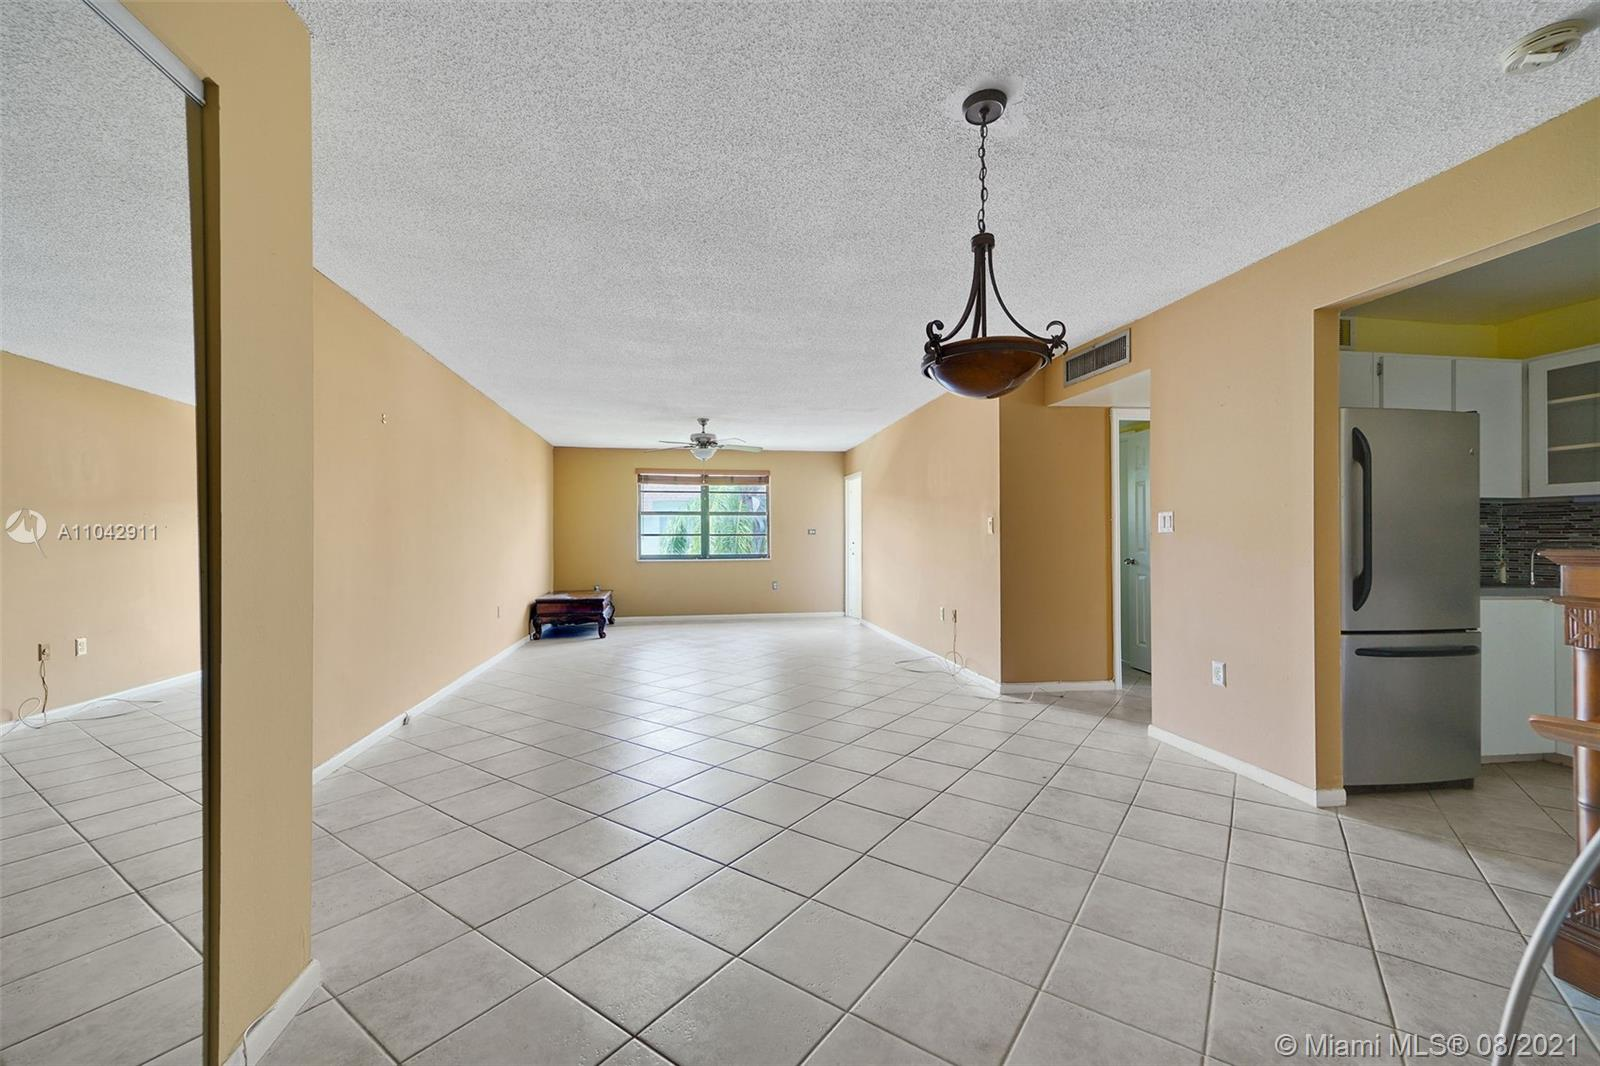 9020 8th Ave Unit 3 A, Miami Shores, Florida 33138